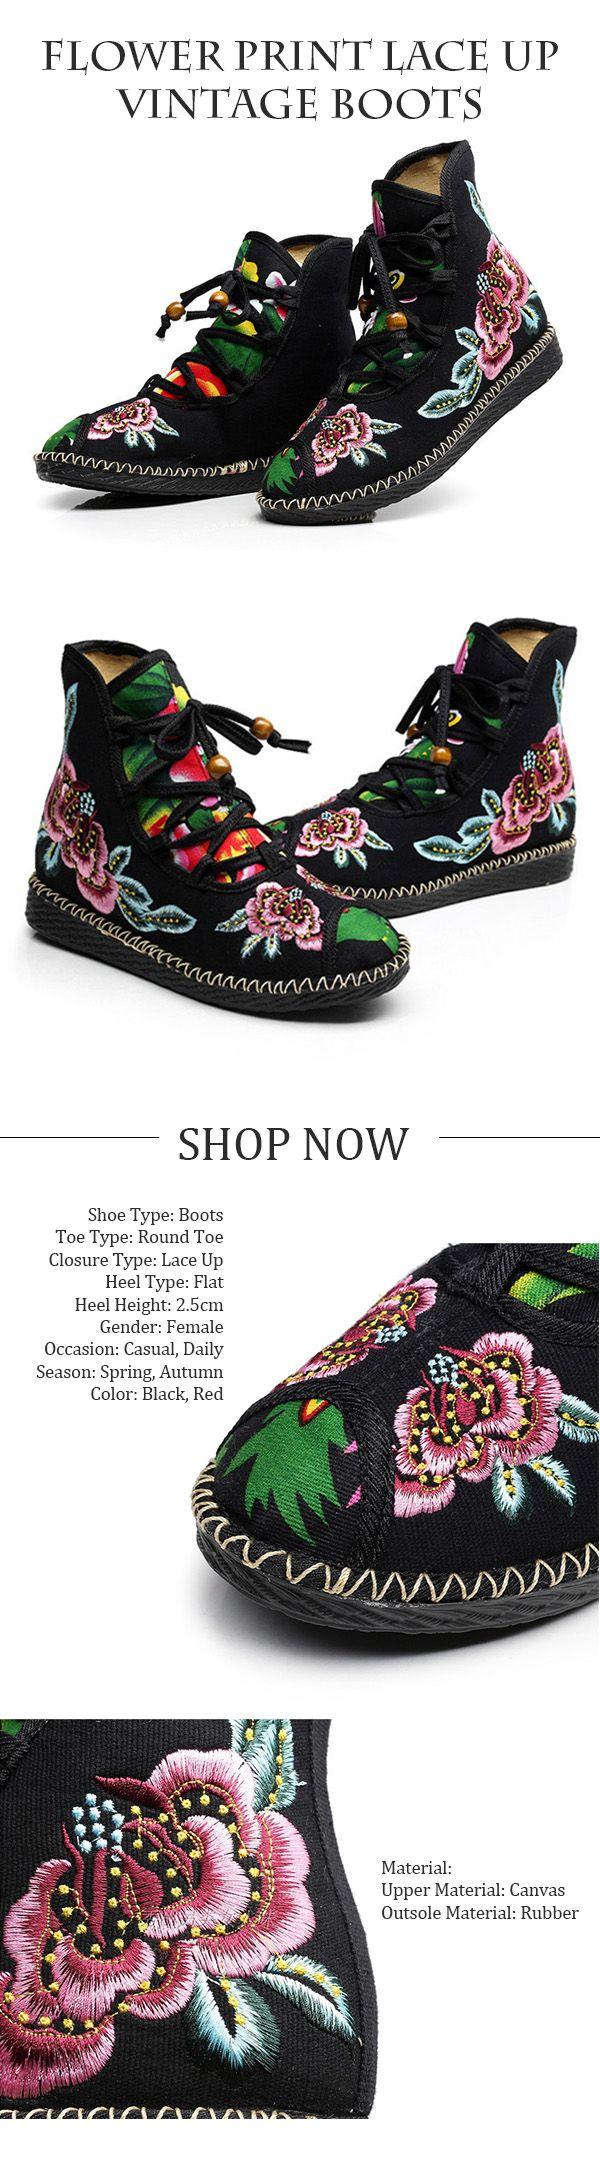 US$21.75 Flower Print Lace Up Vintage Boots